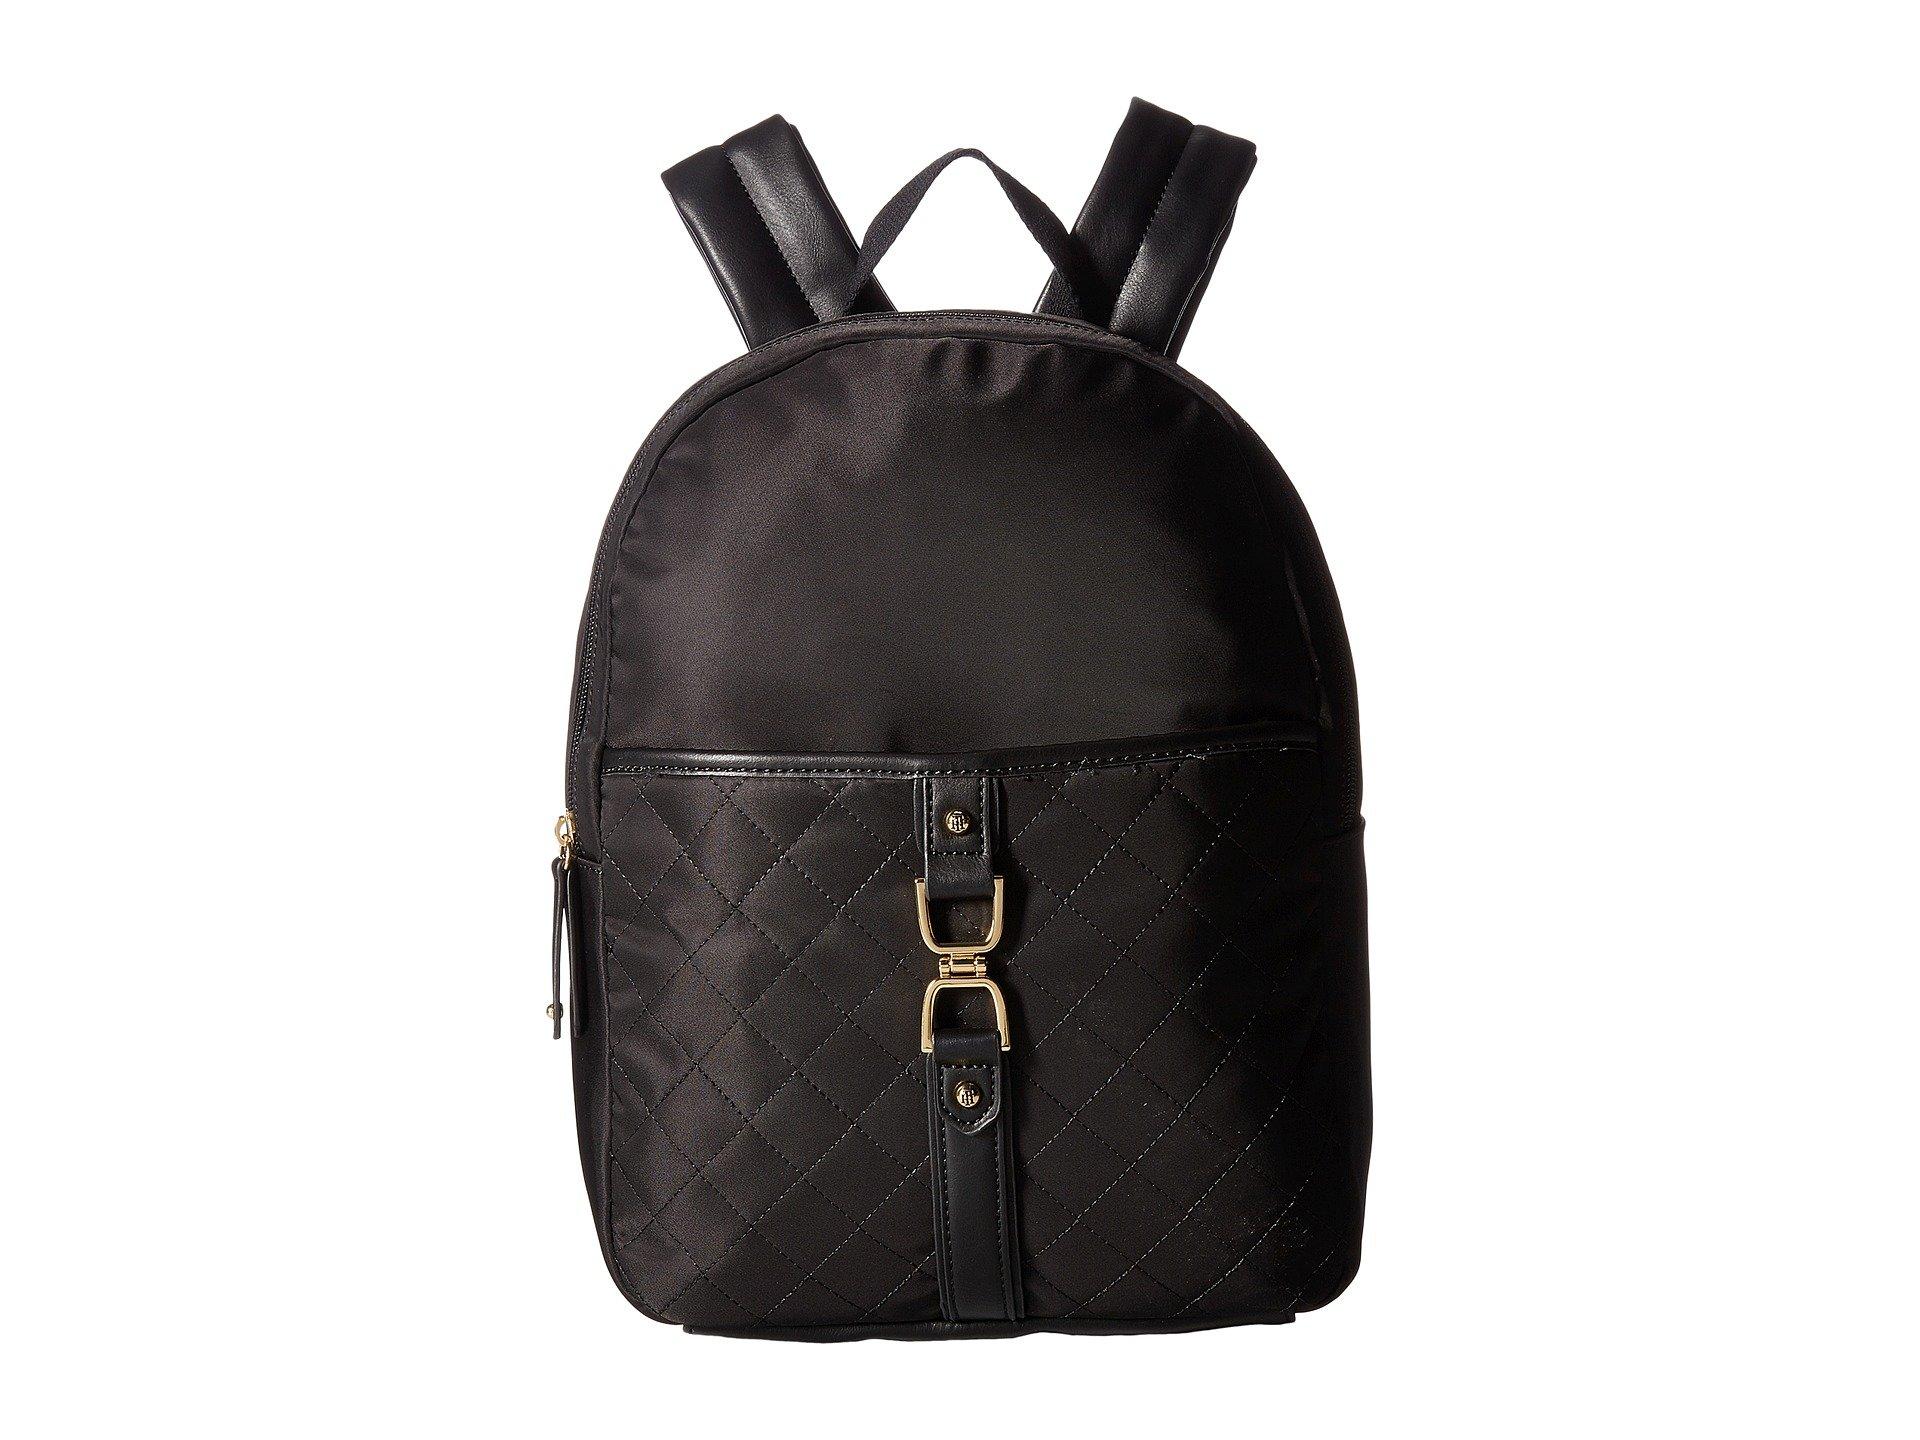 Mochila para Mujer Tommy Hilfiger Thea Quilt Nylon Backpack  + Tommy Hilfiger en VeoyCompro.net